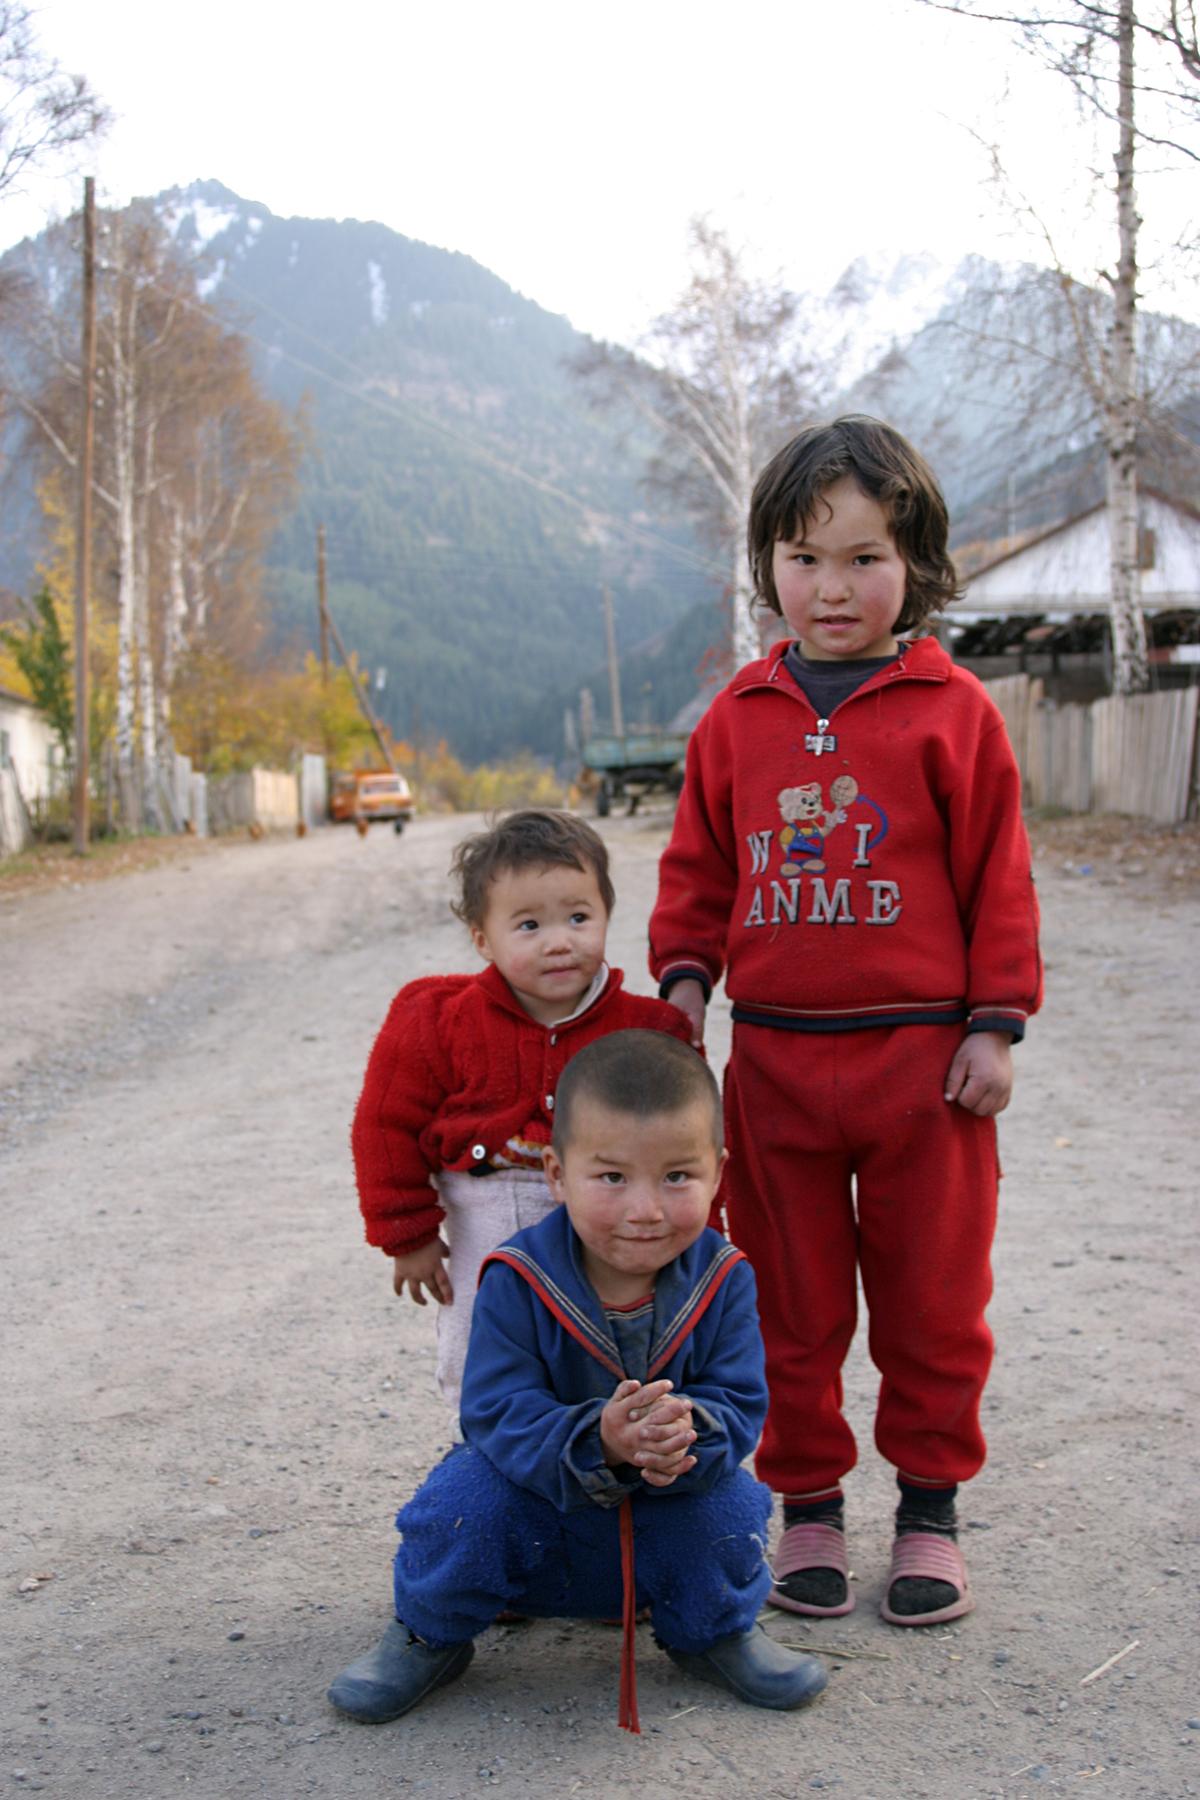 Kinder in Karakol, Kirgistan, 2006